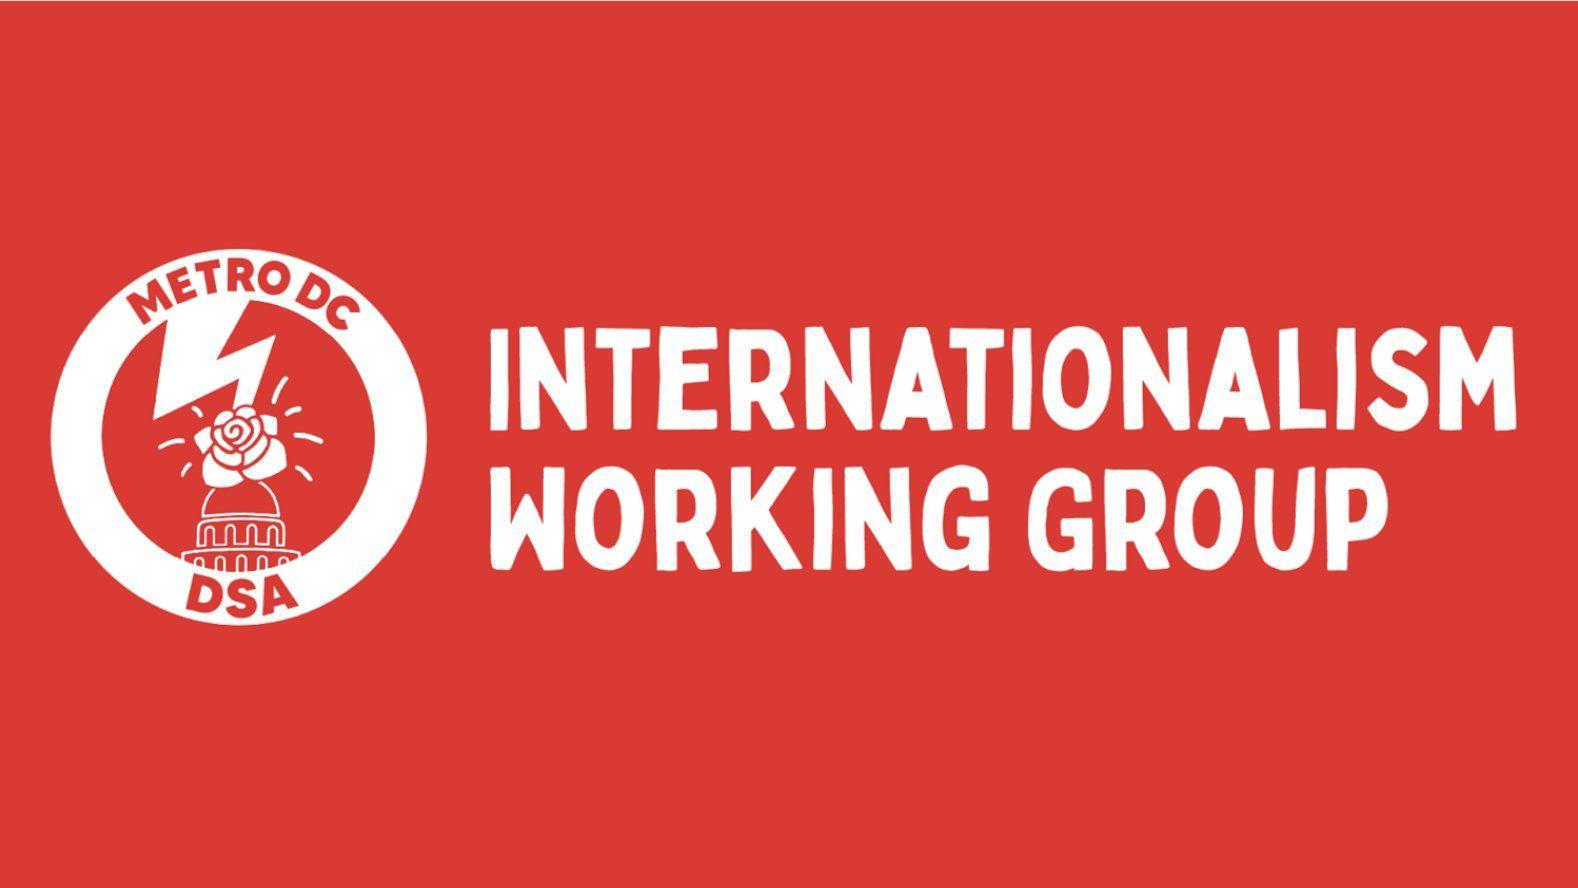 Metro DC DSA Internationalism Working Group Monthly Meeting